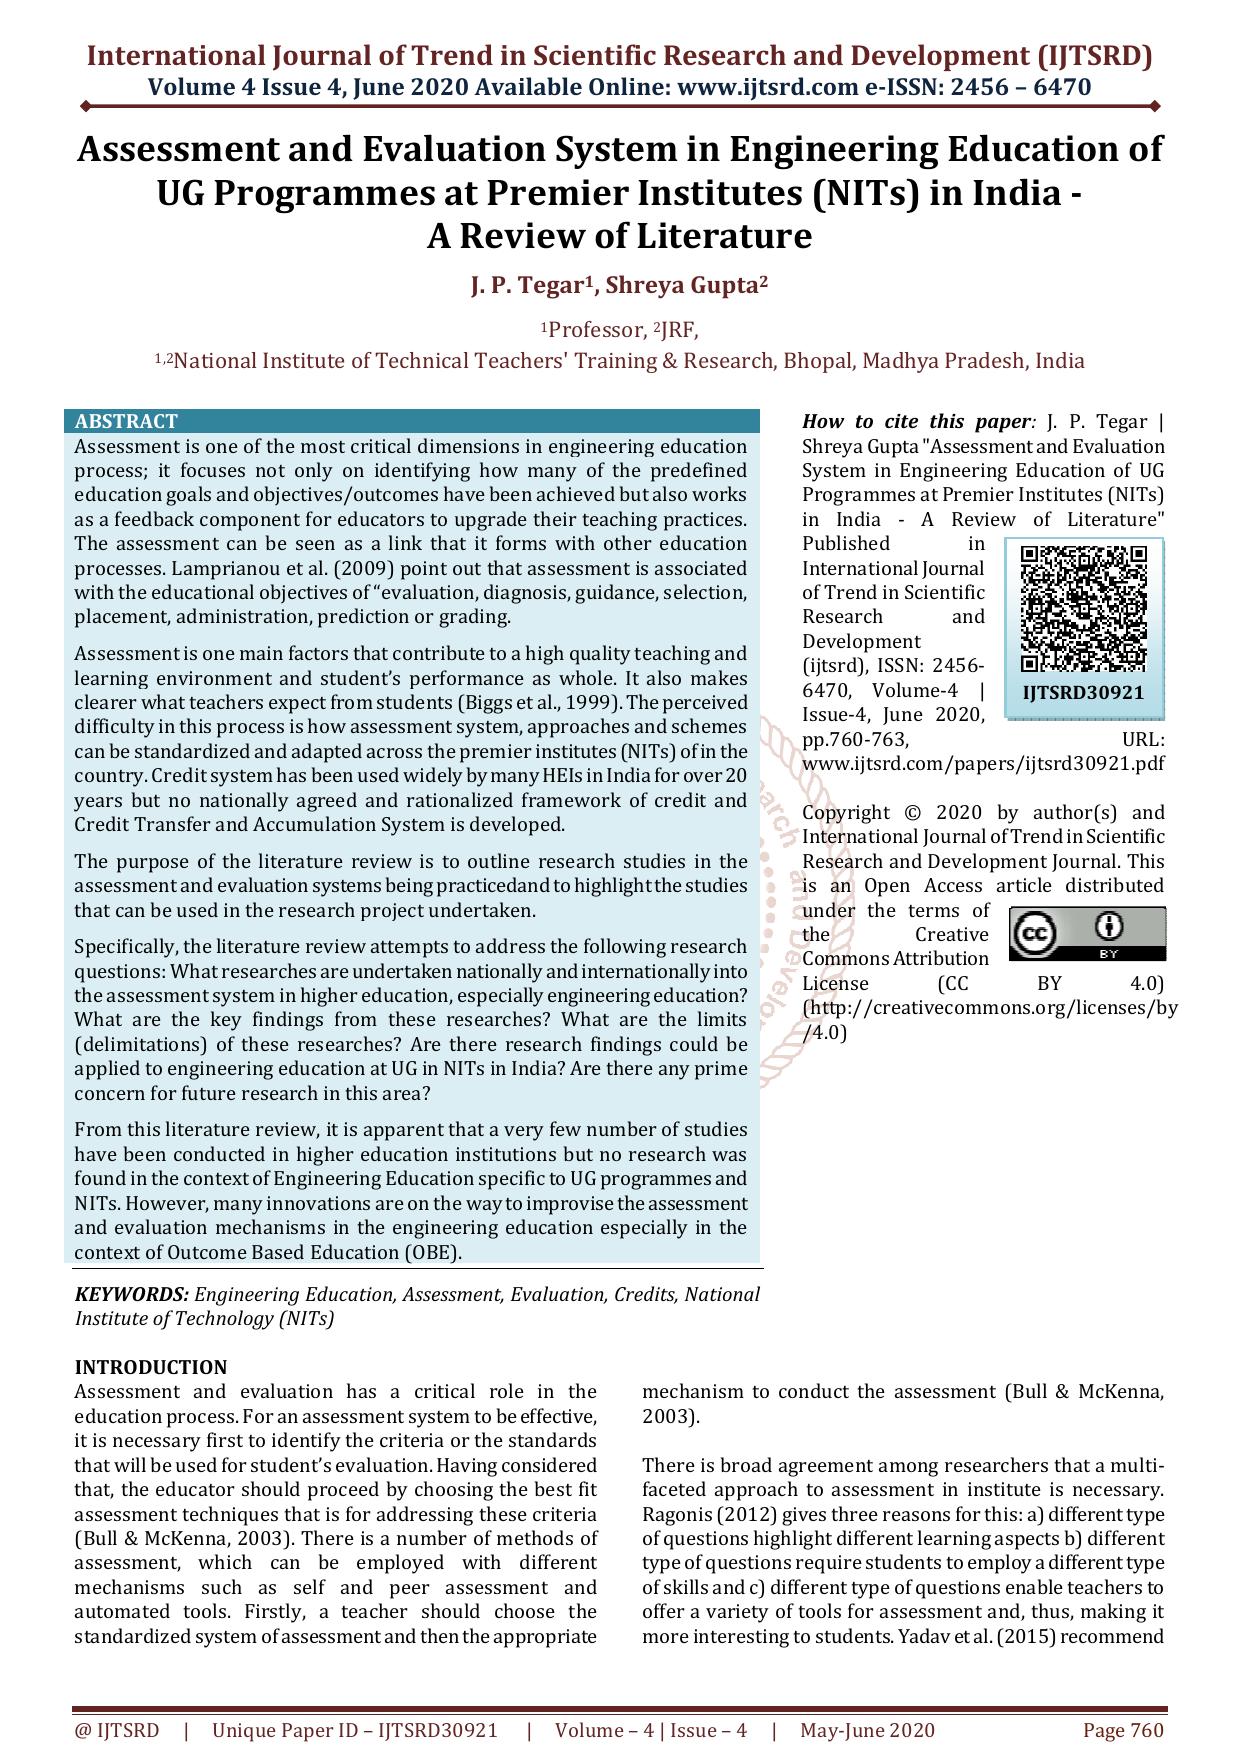 Cover letter for data analyst fresher